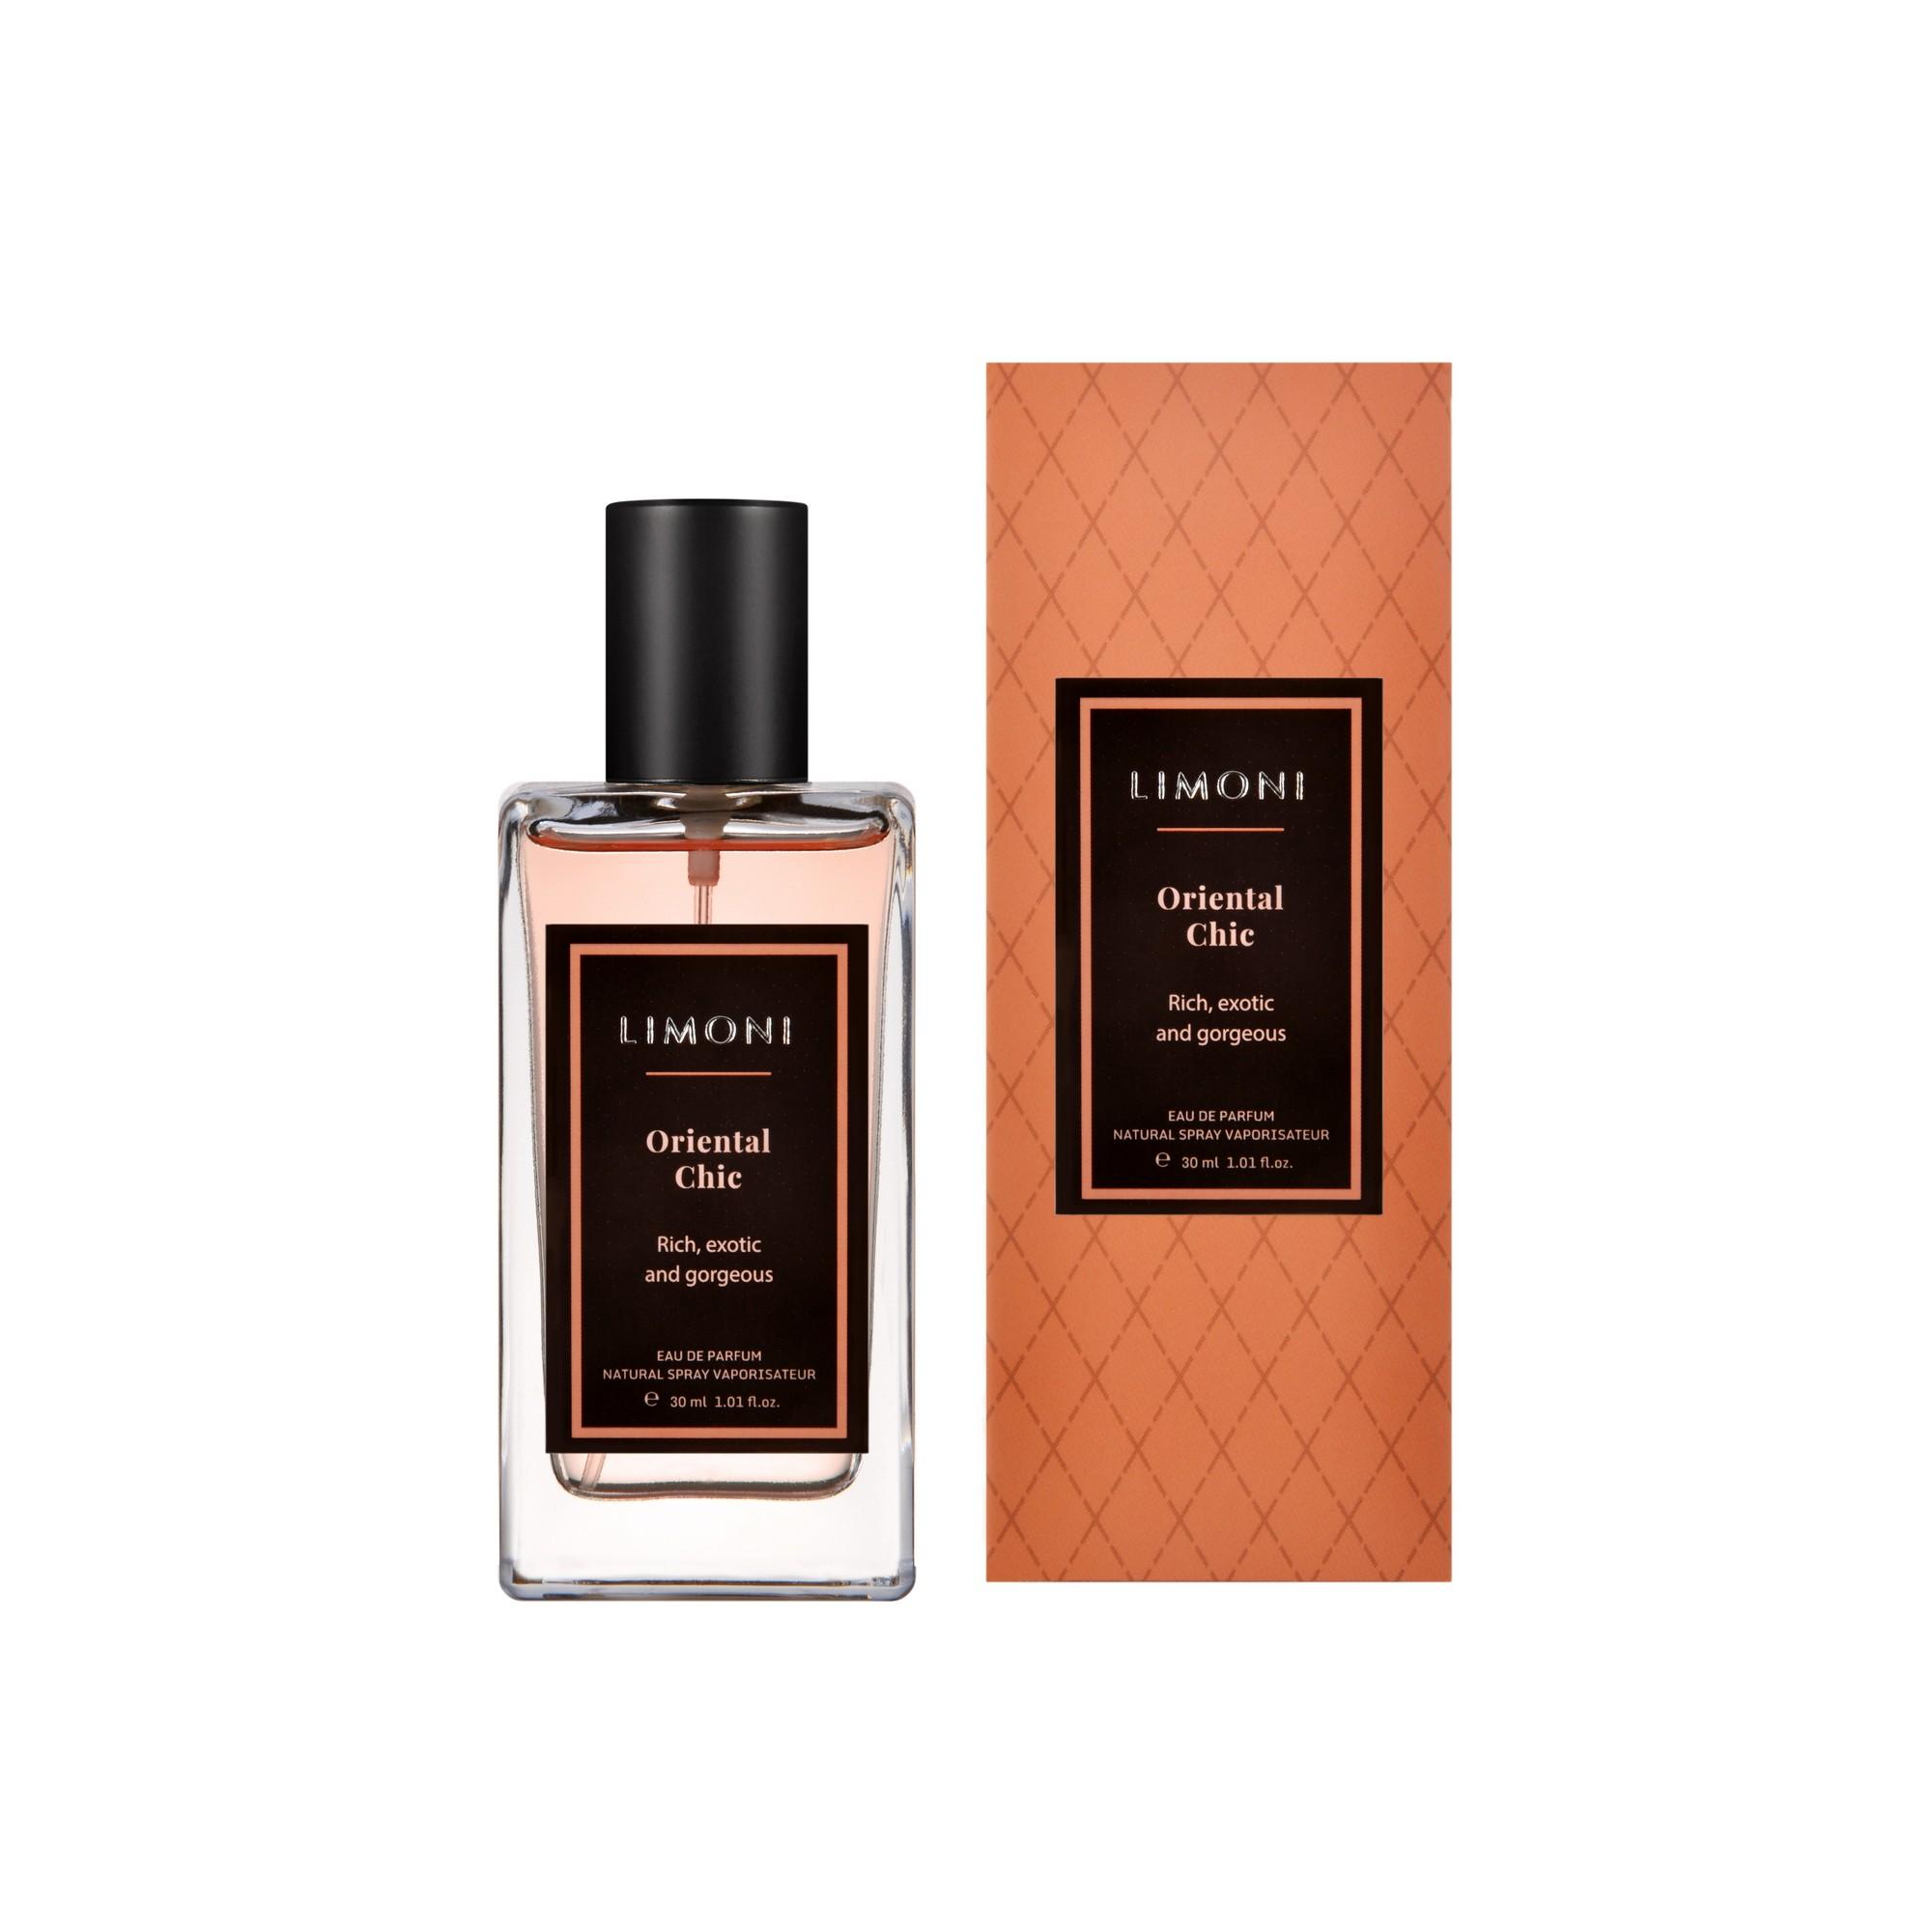 LIMONI Вода парфюмерная / Oriental Сhic Eau de Parfum 30 мл